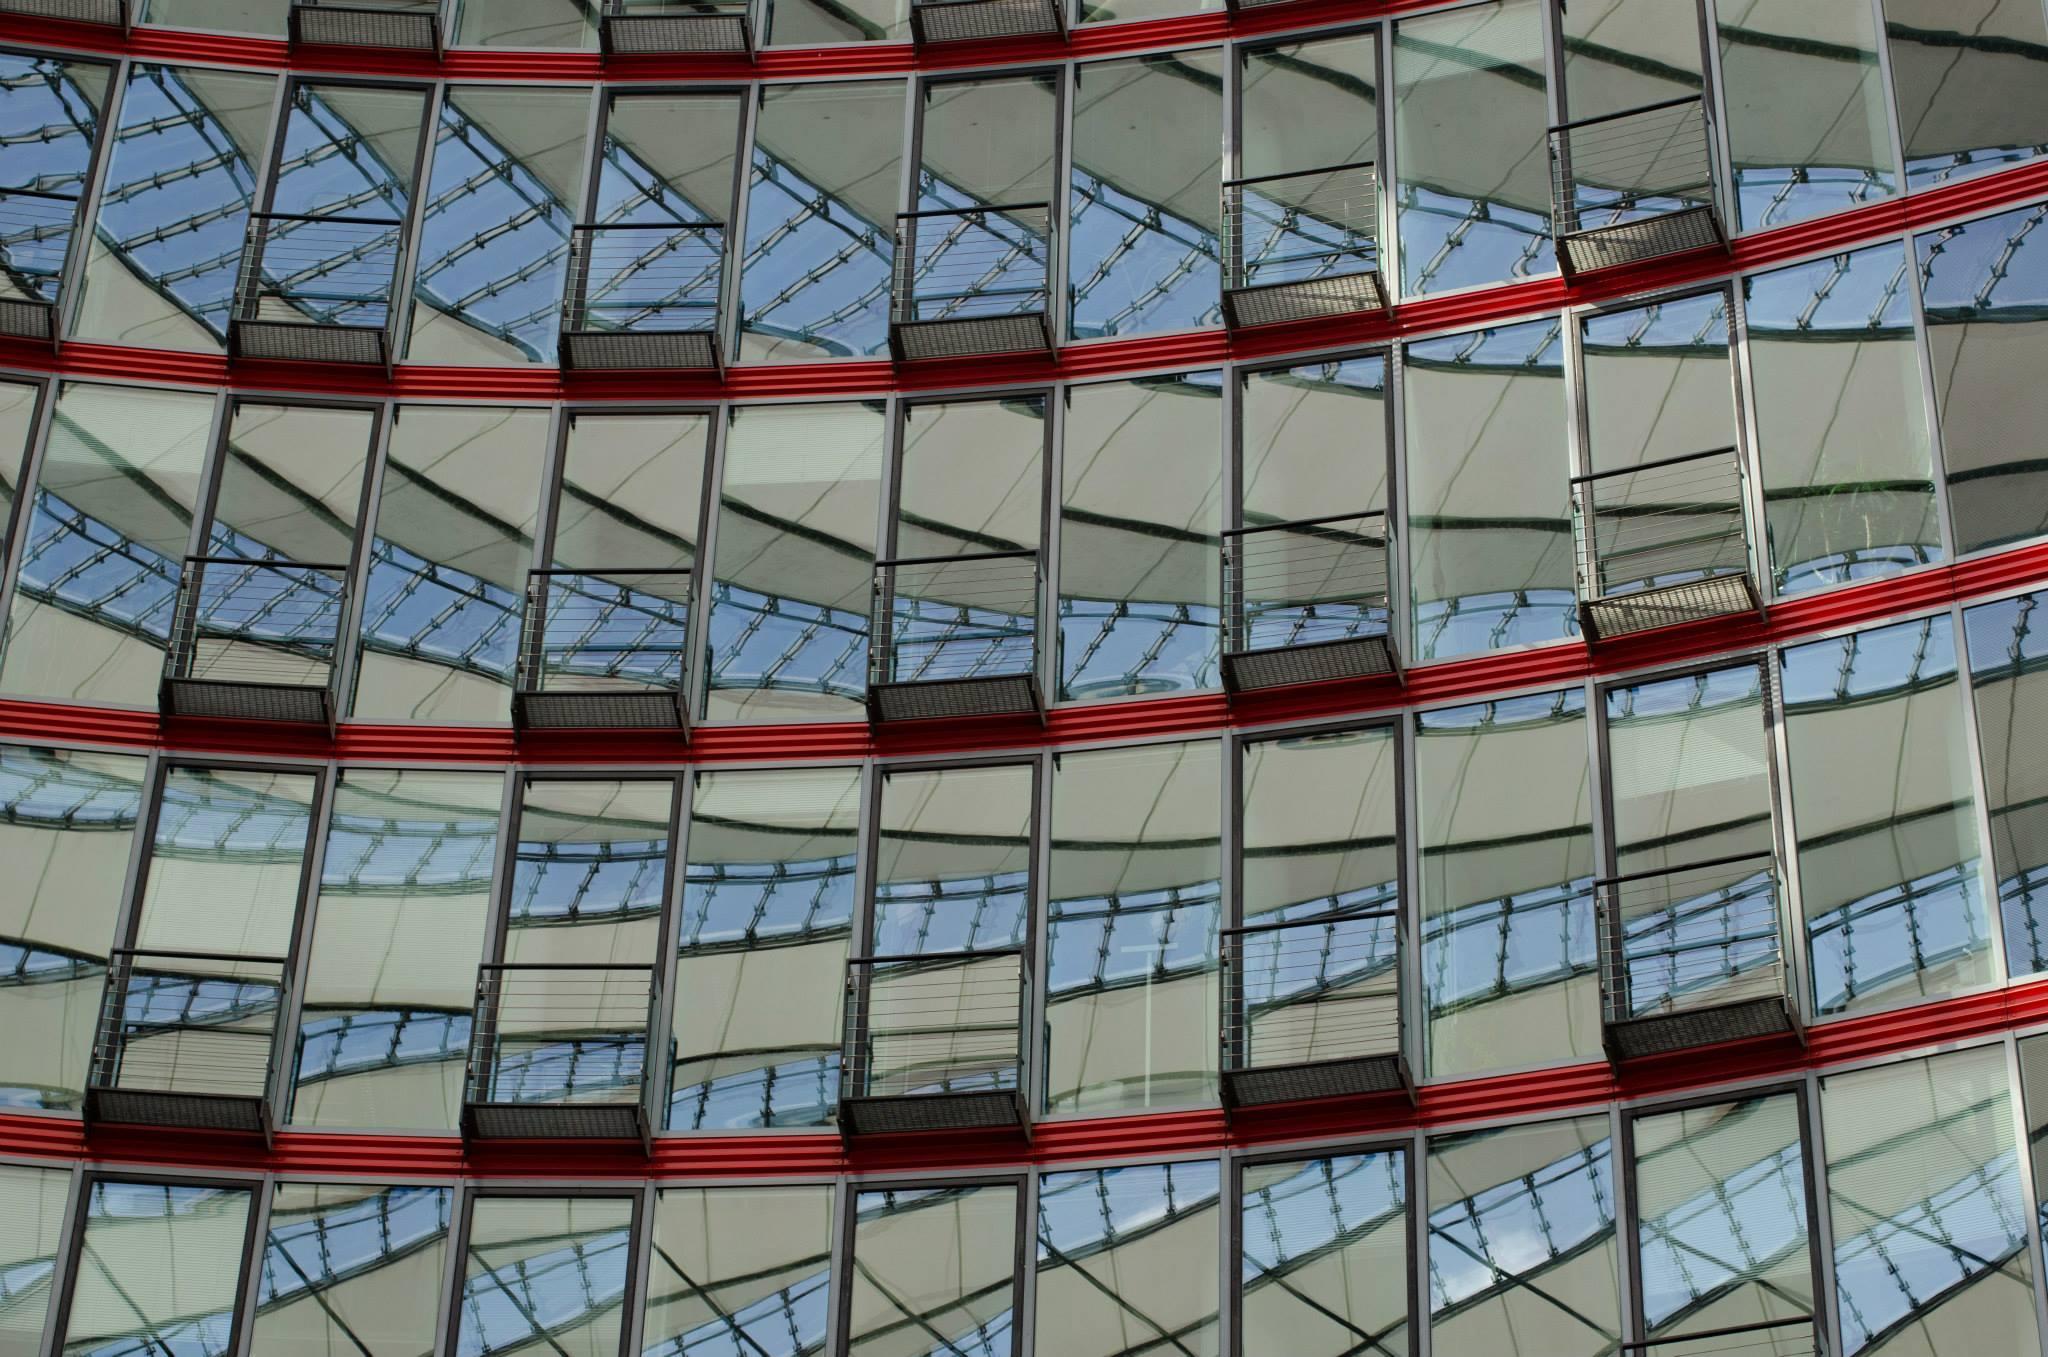 Sony Center windows